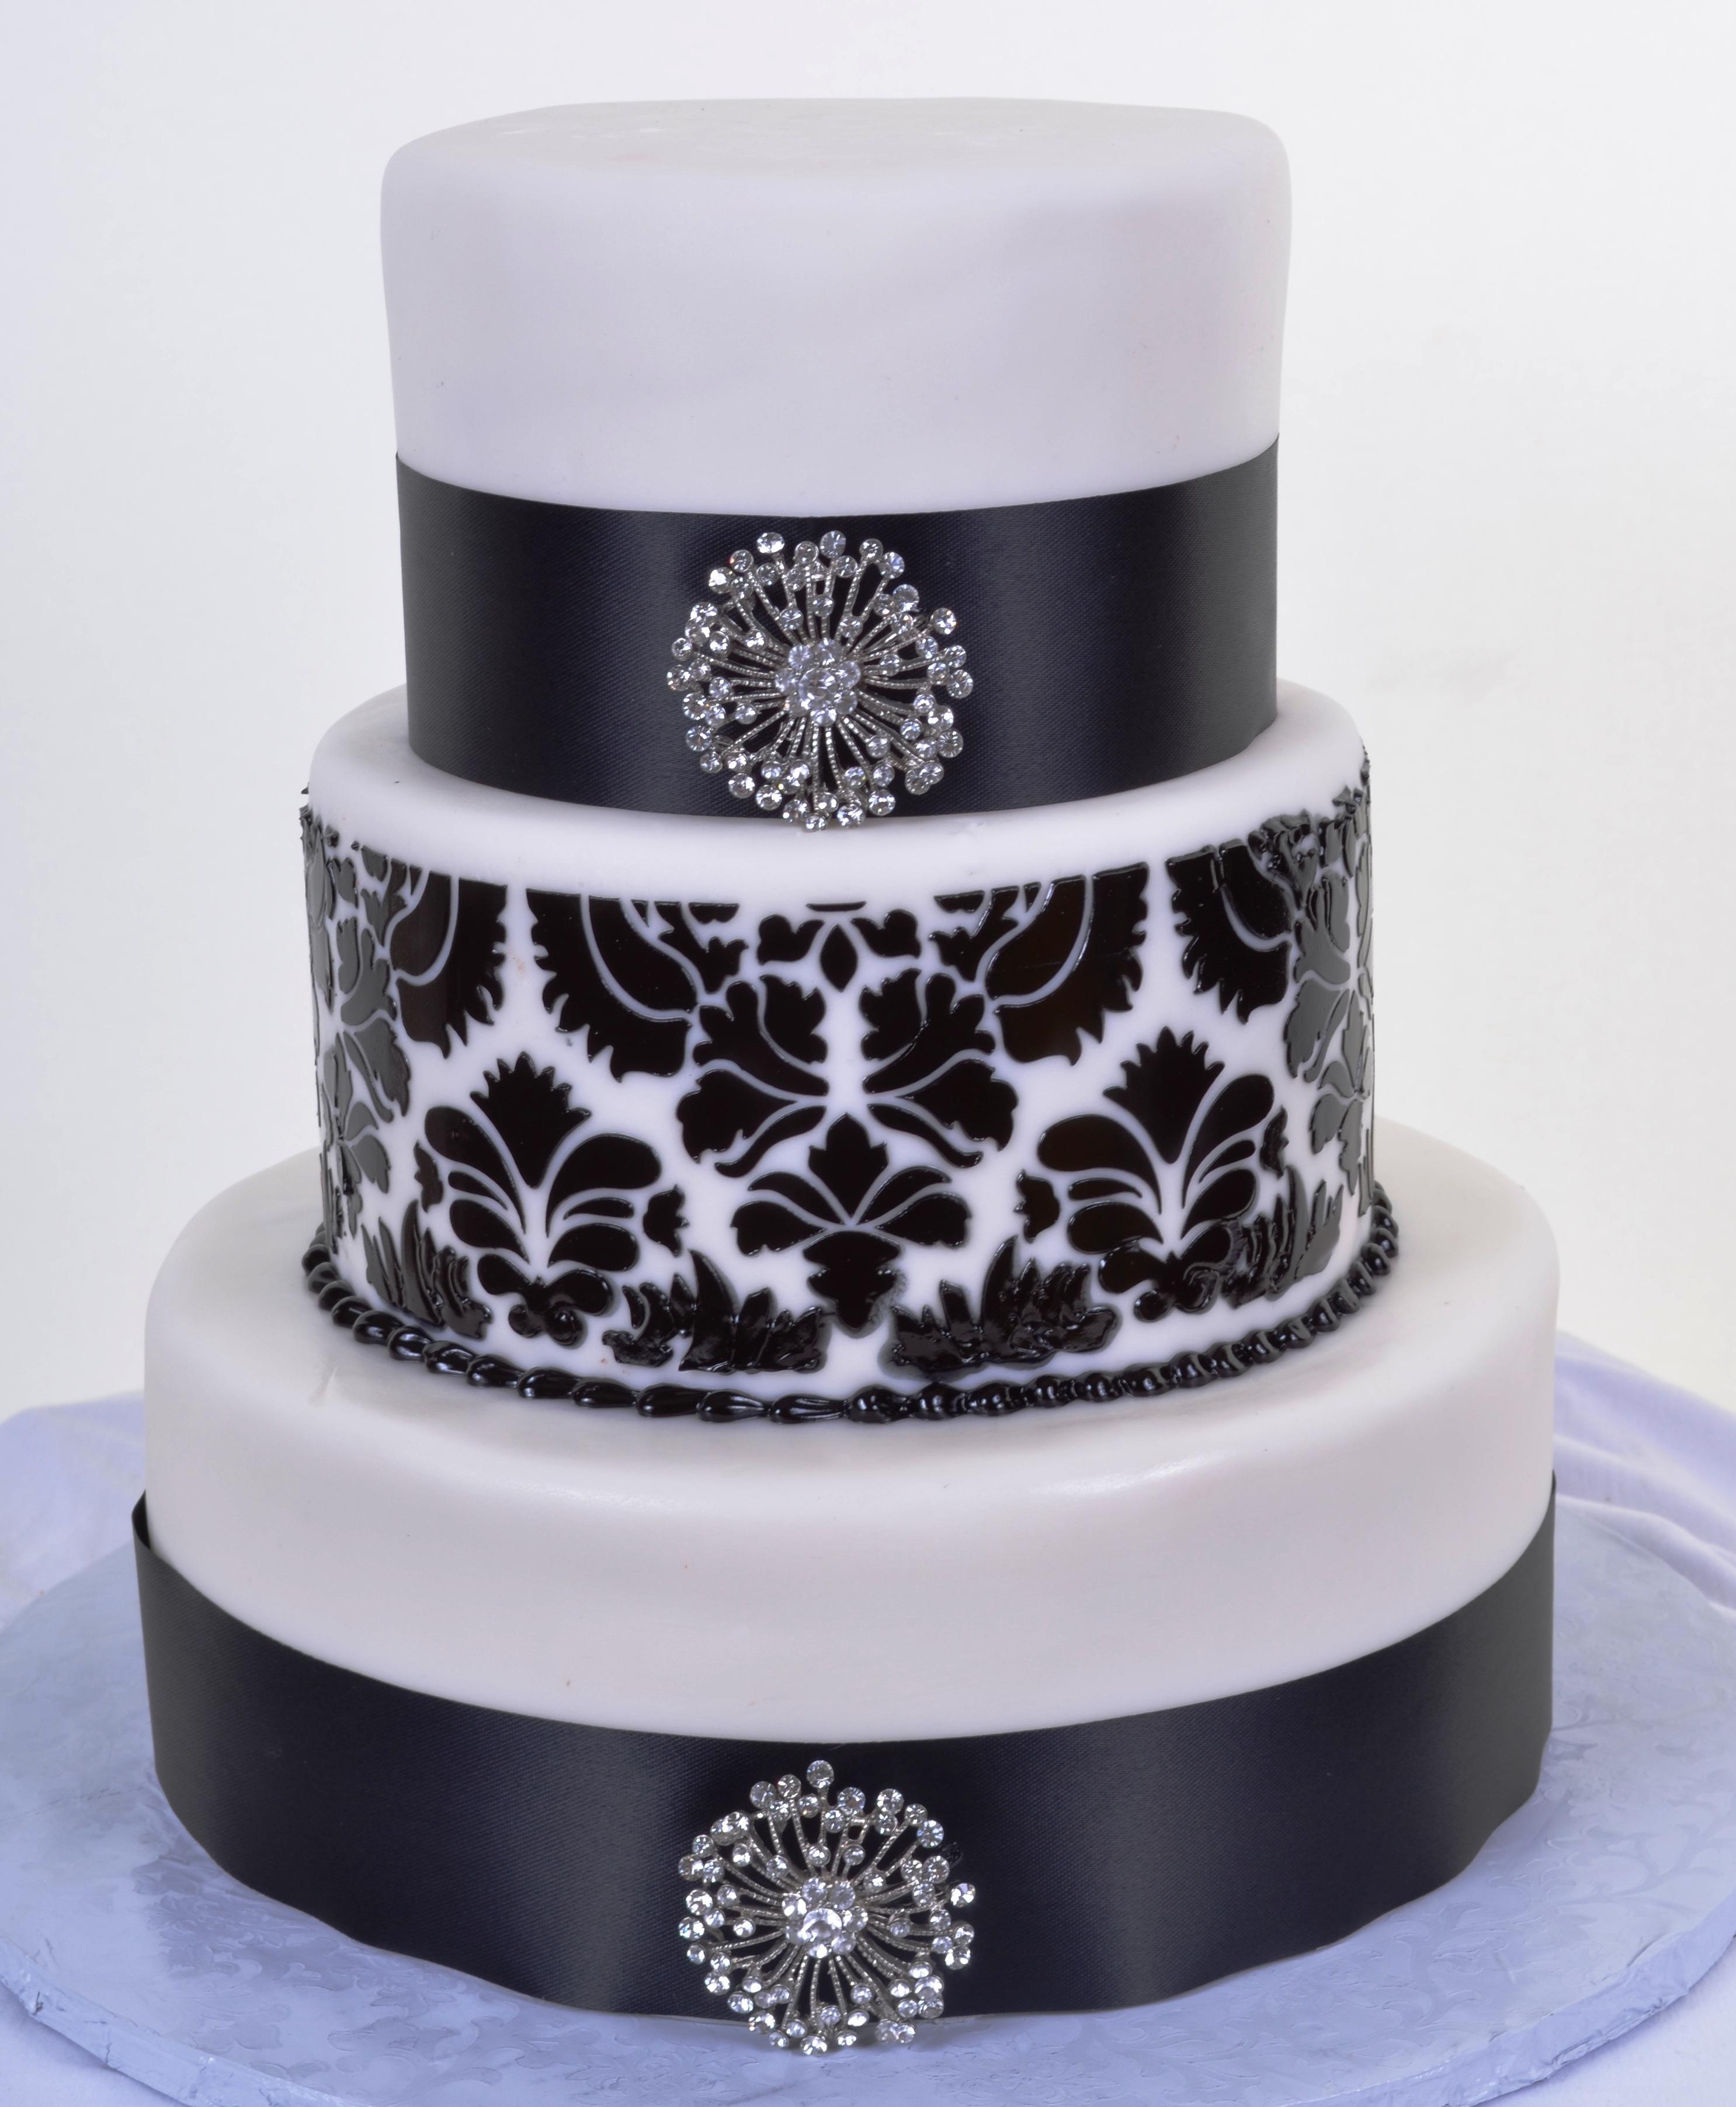 Pastry Palace Las Vegas - Wedding Cake 929 - Black and White Damask